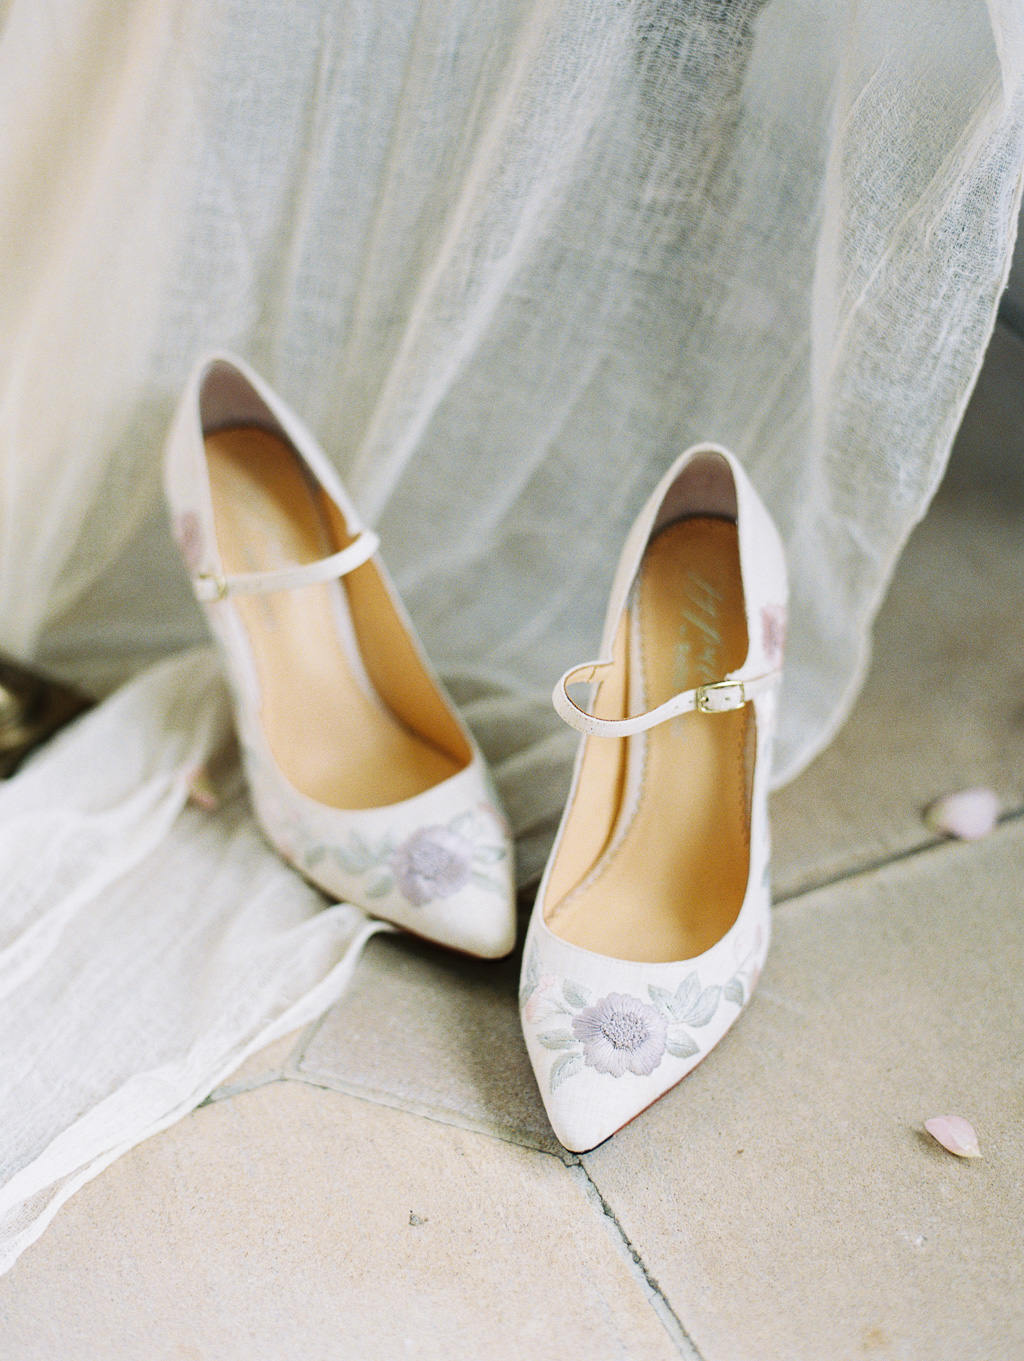 Bella-belle-floral-wedding-heels